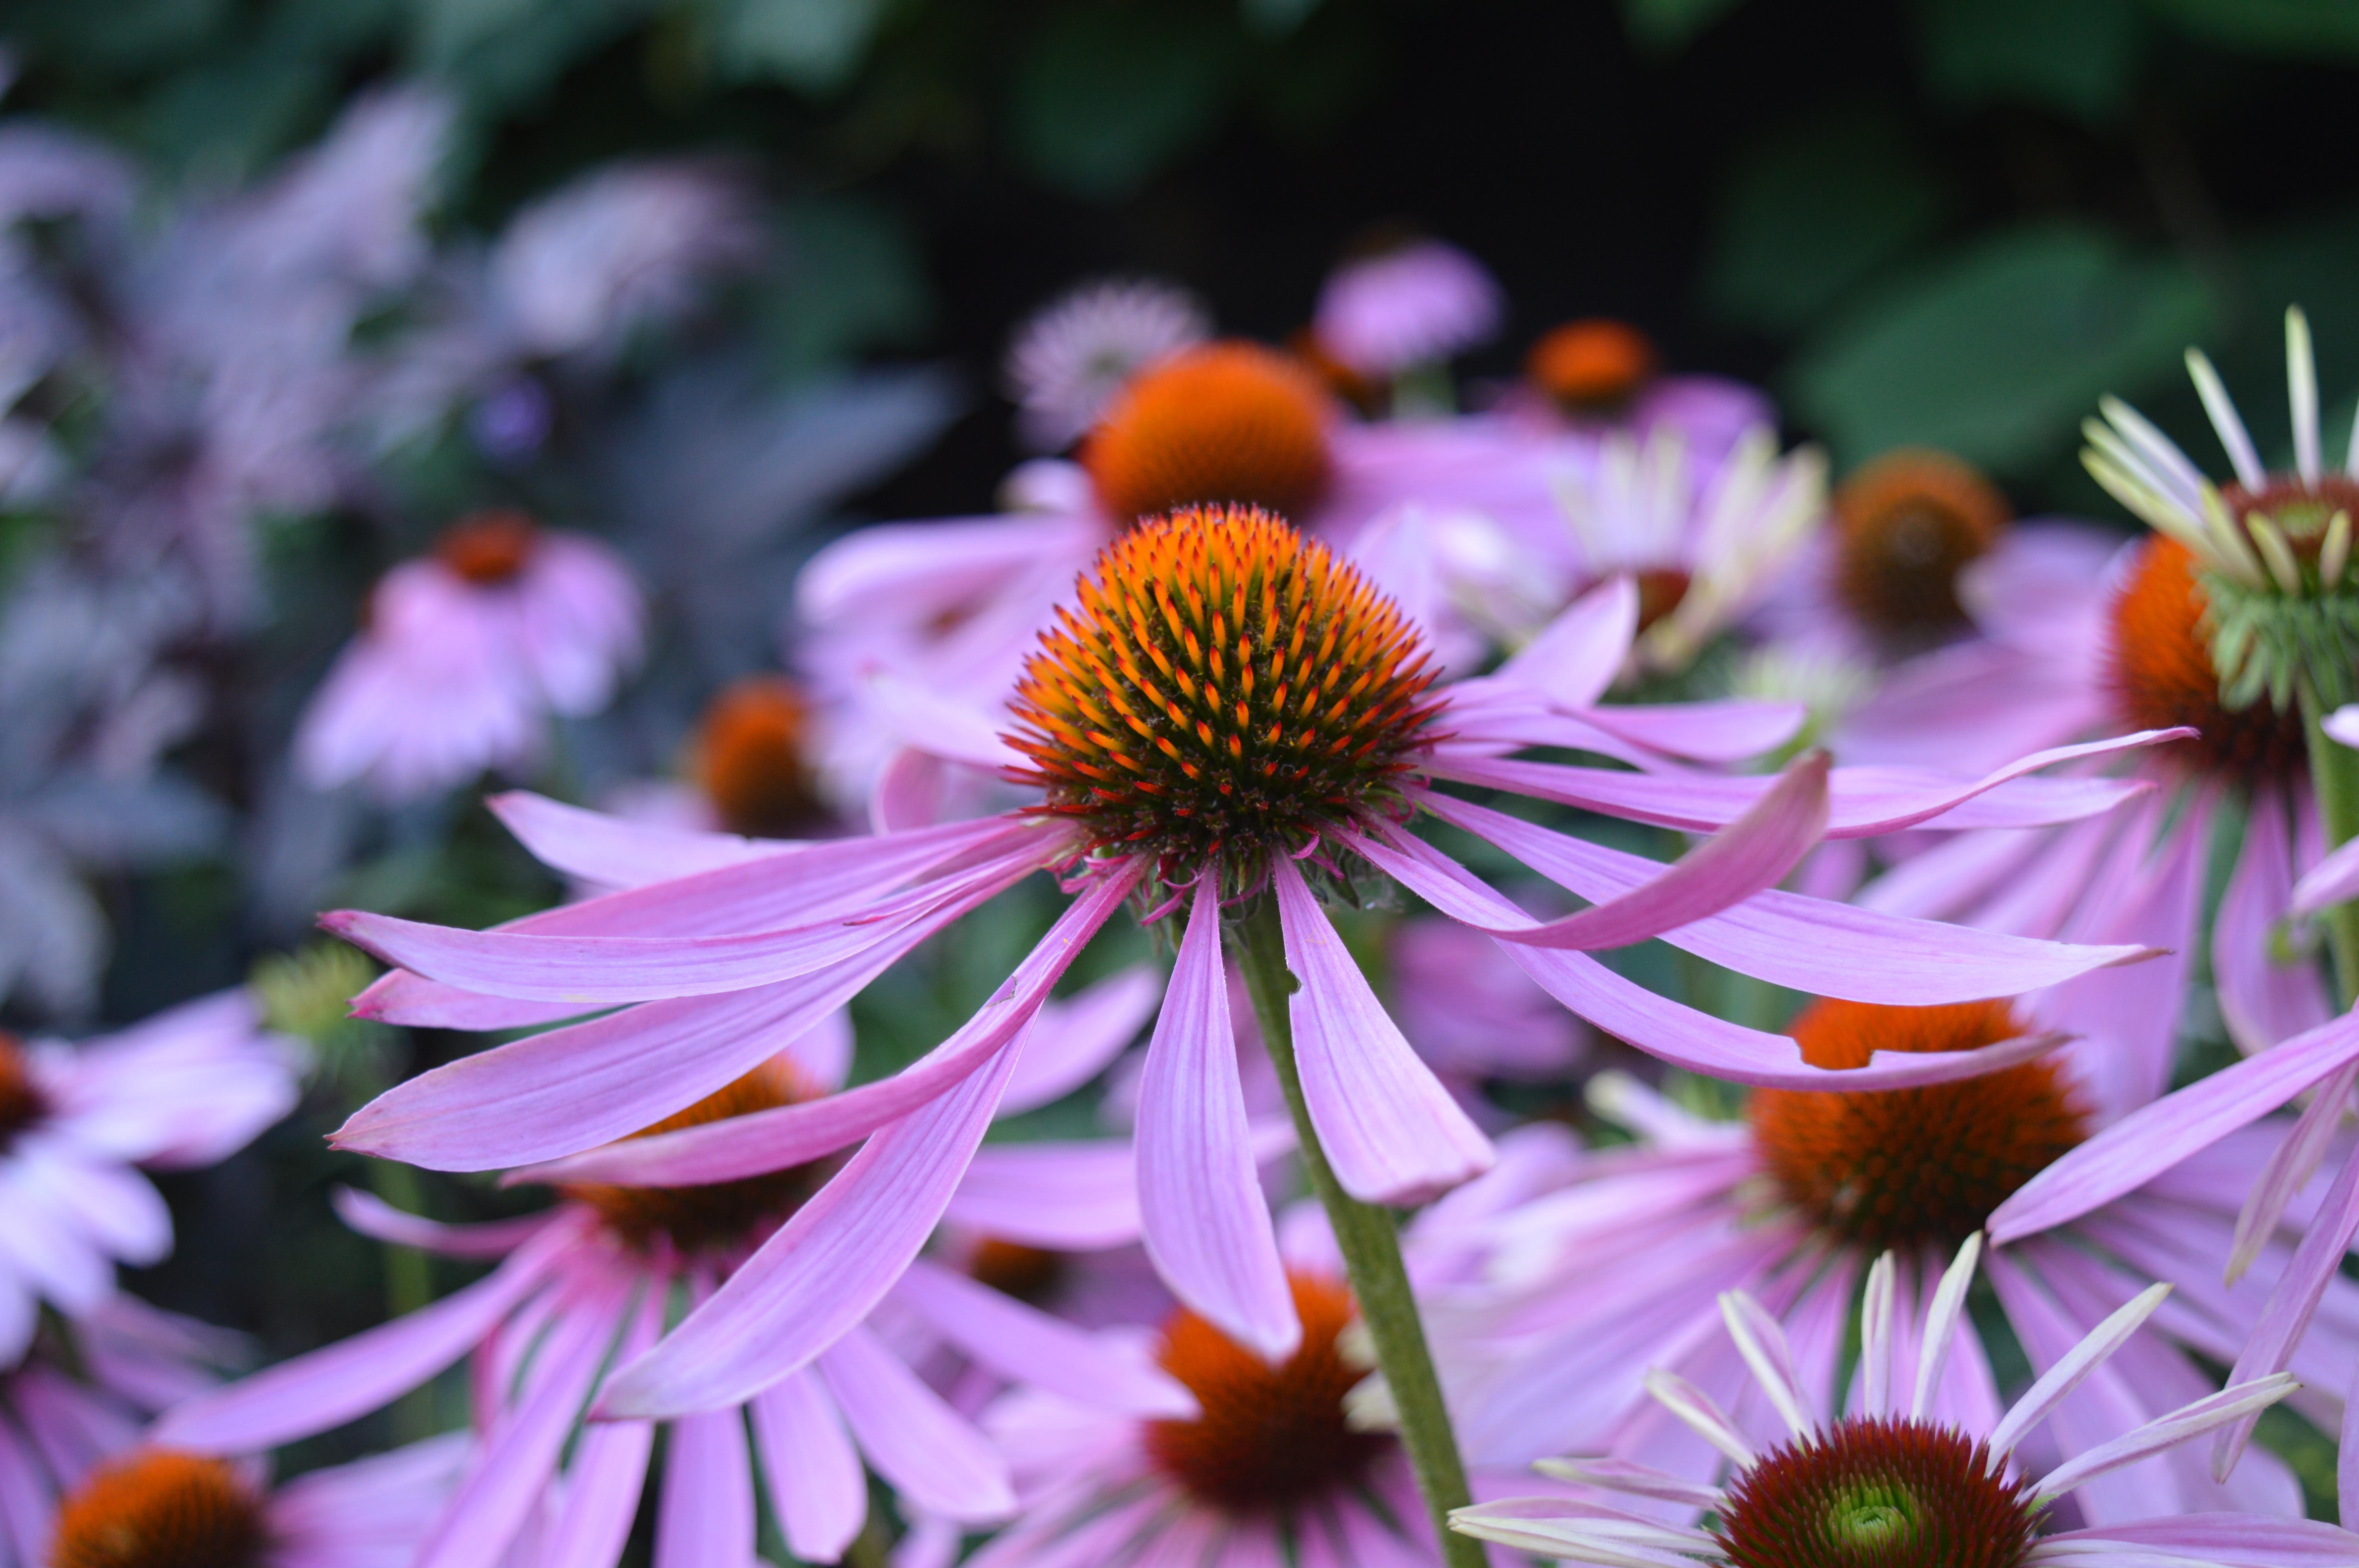 Louise Nicholls - Adventures in horticulture